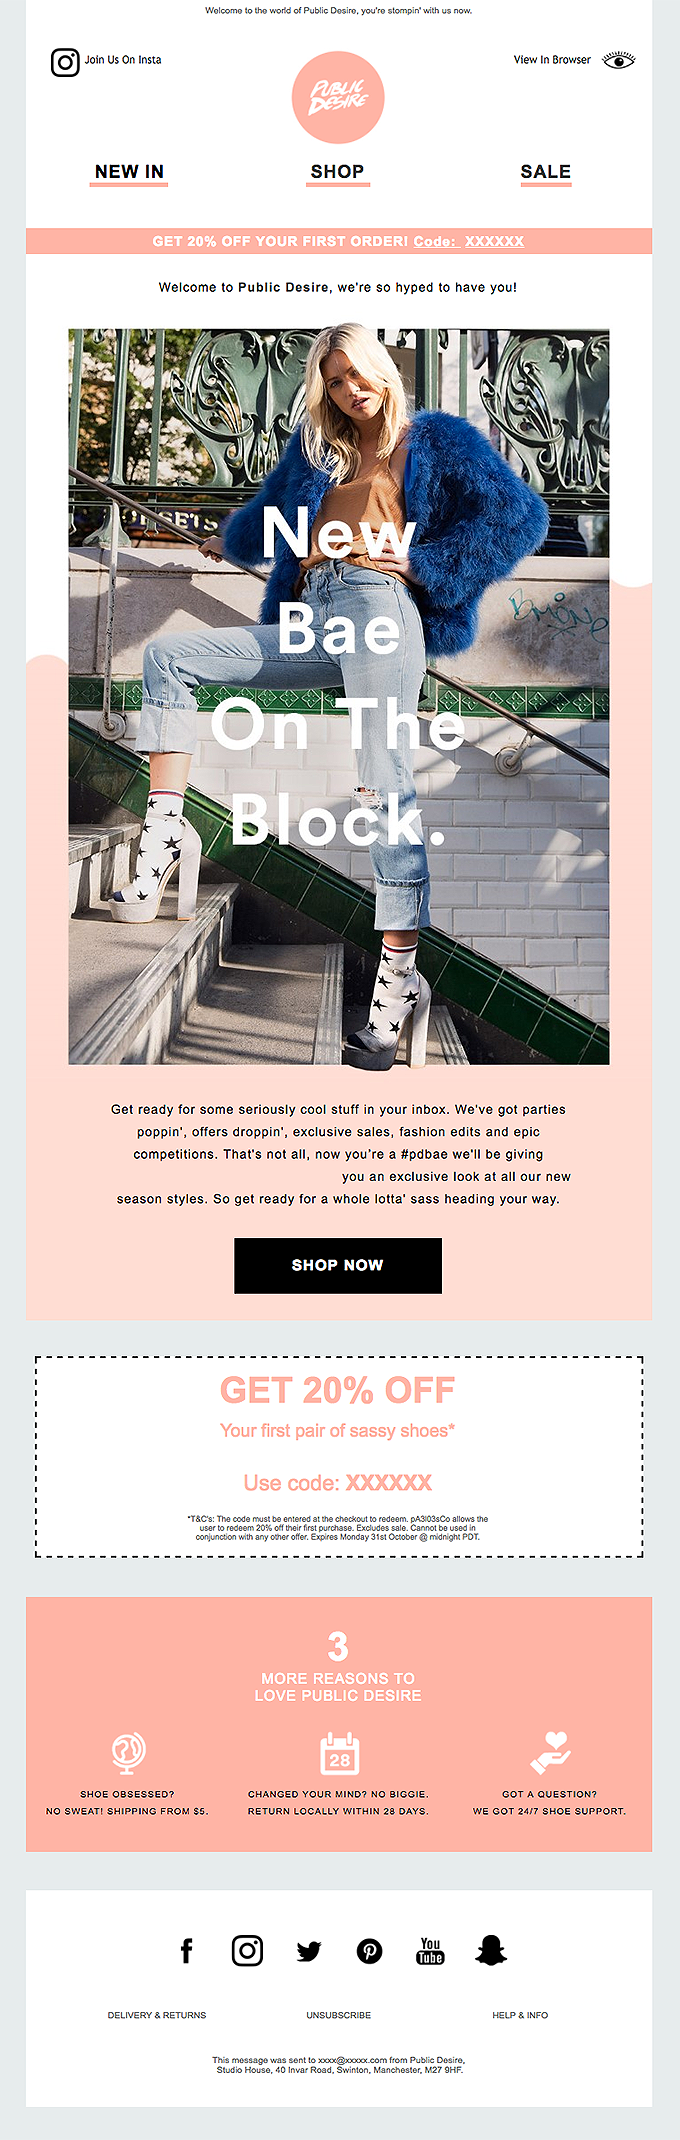 Hey new bae on the block ❤